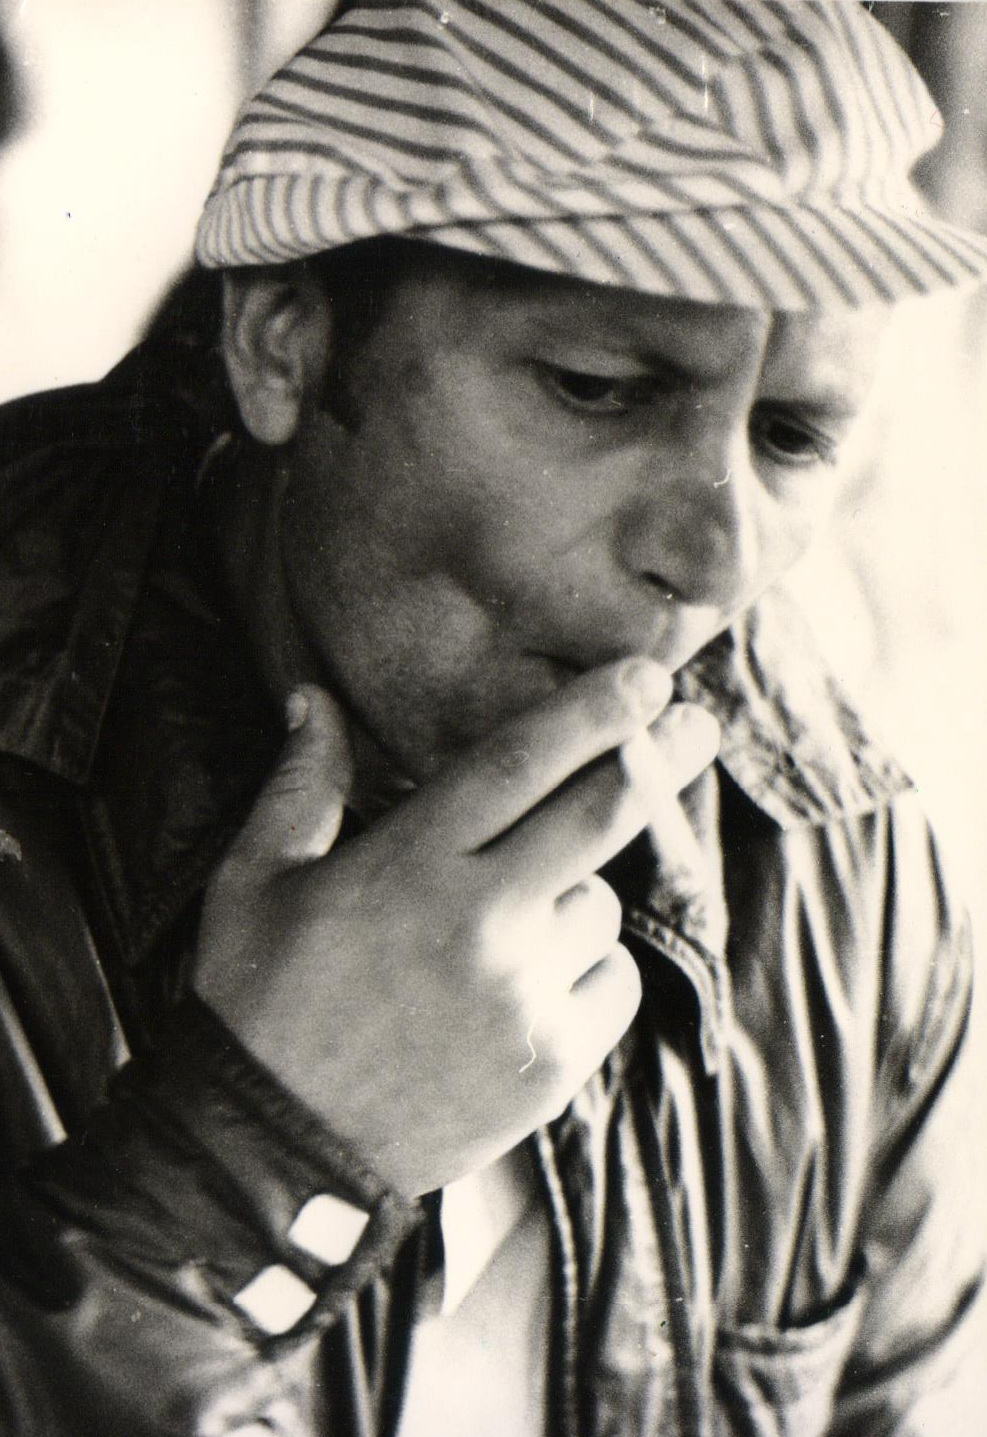 Rašytojui Augustui Tamaliūnui – 75